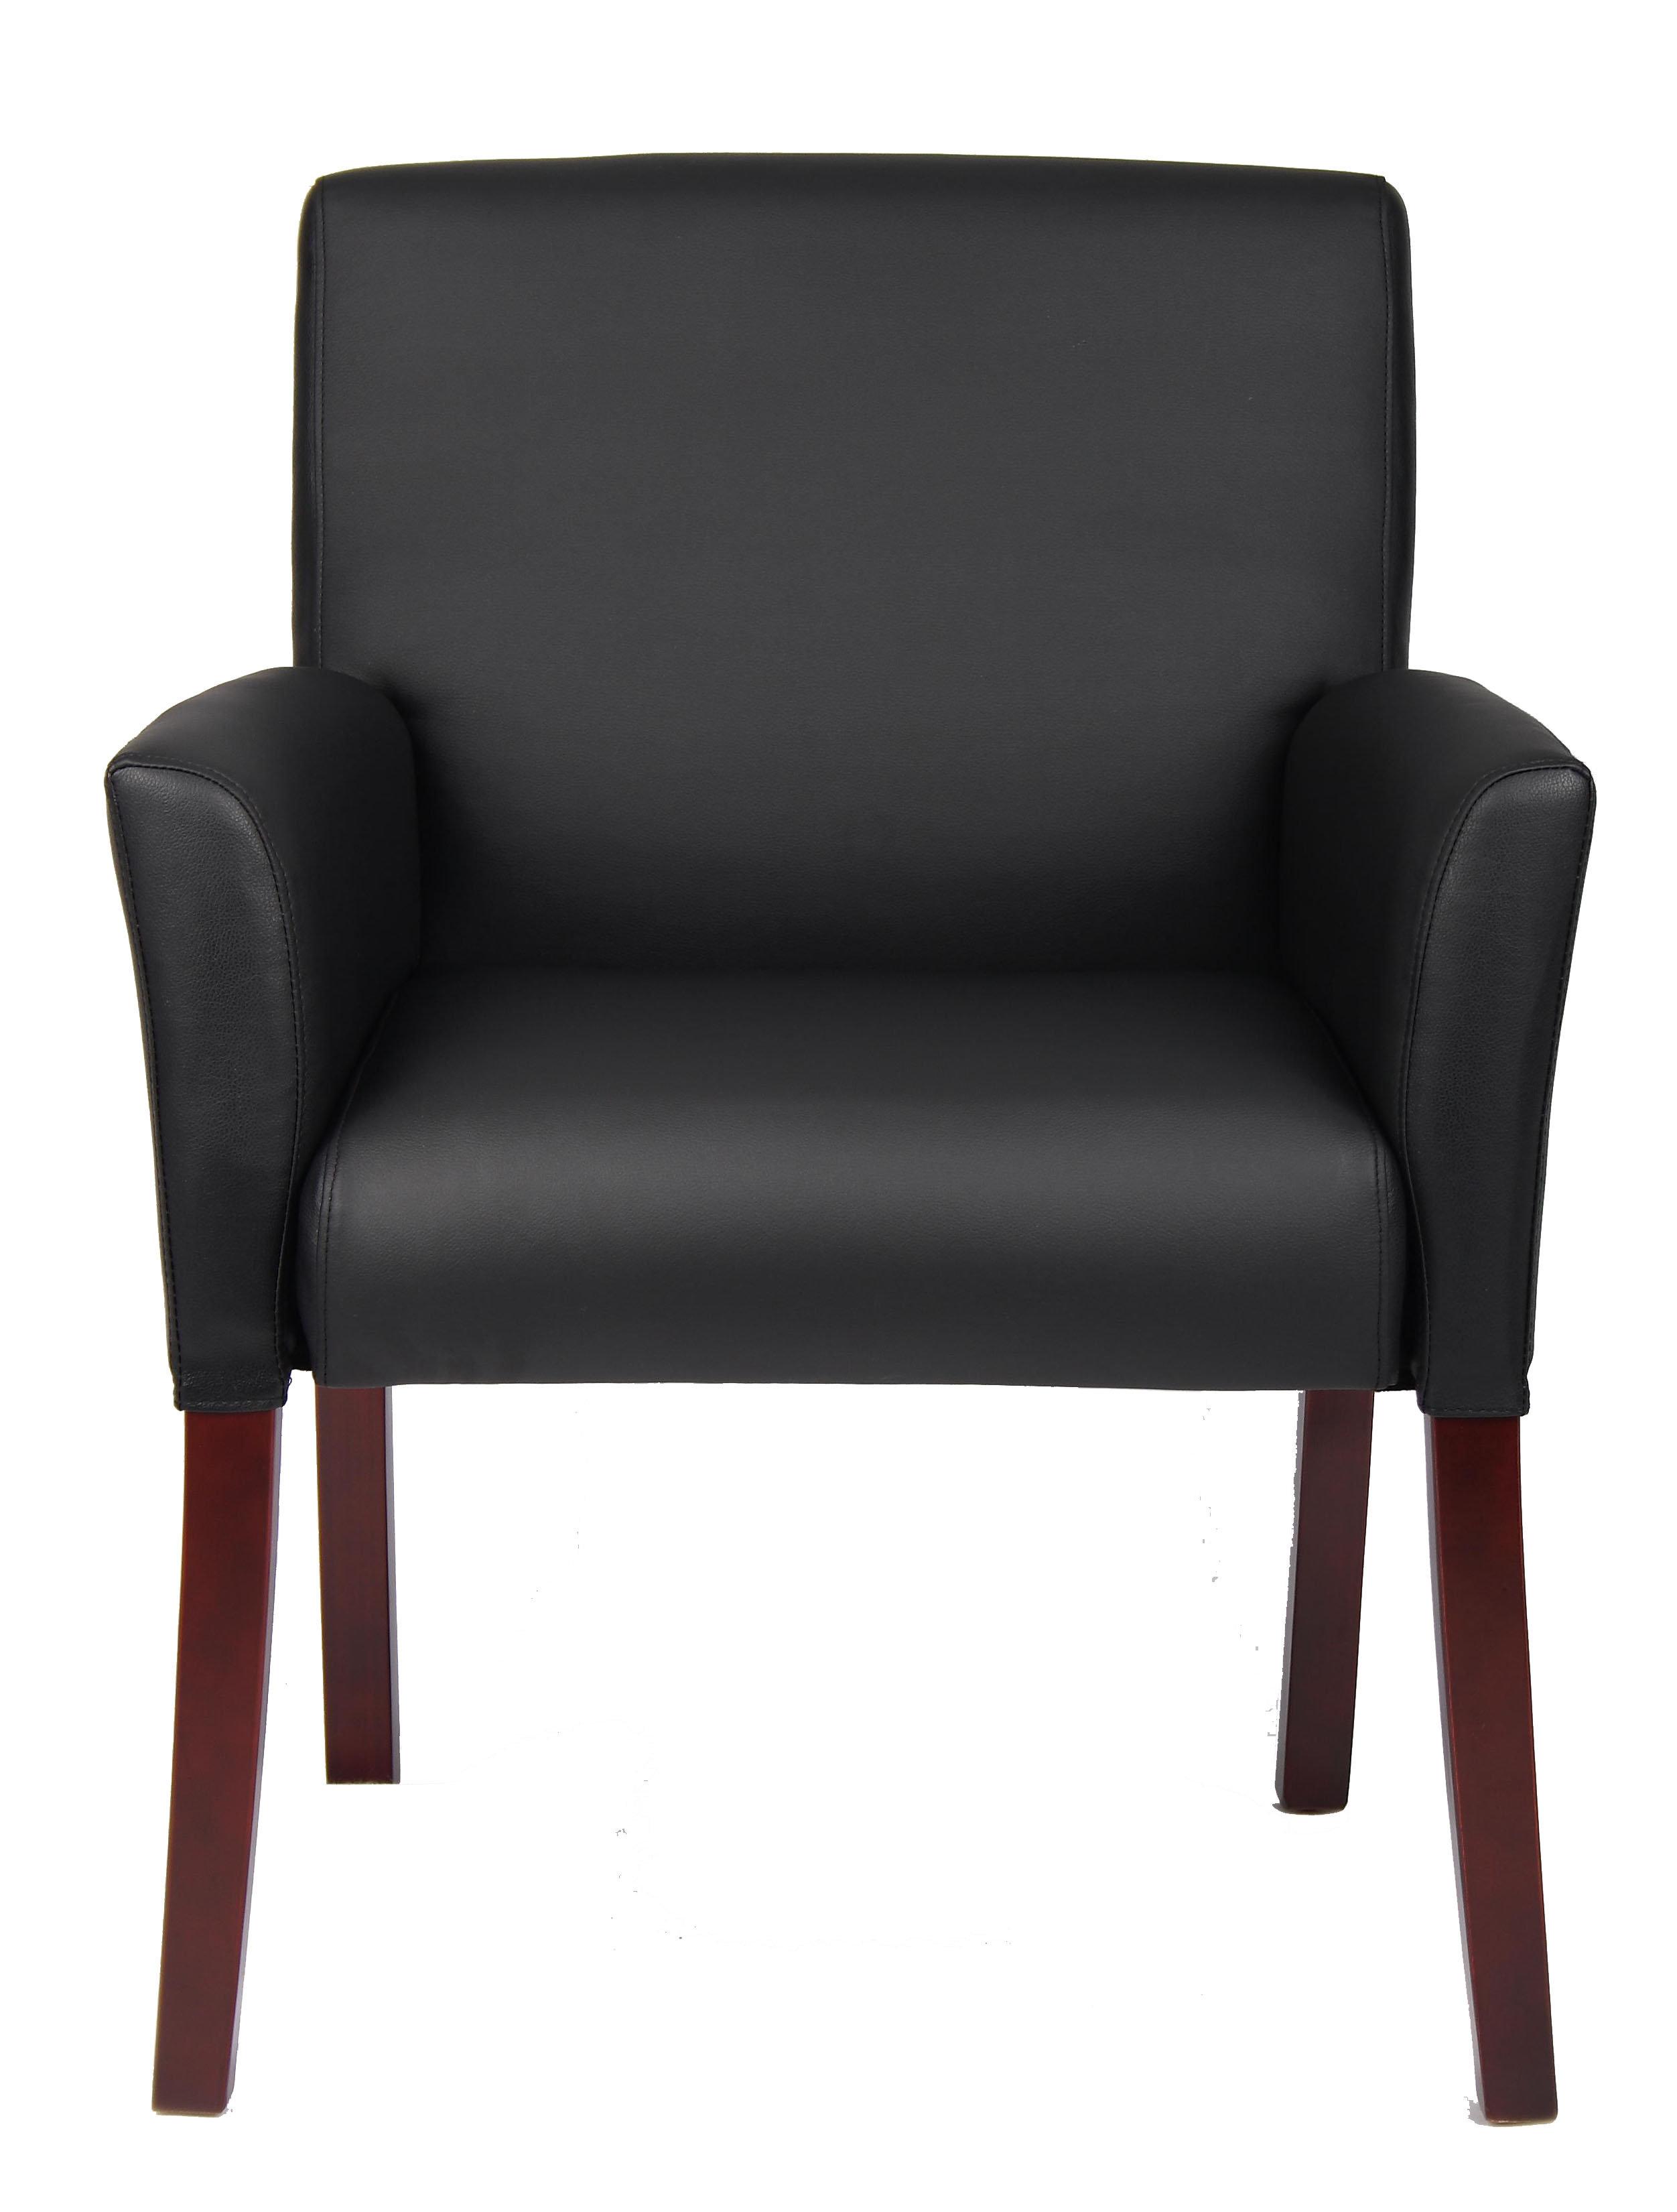 Ebern Designs Szymon Upholstered Dining Chair Wayfair